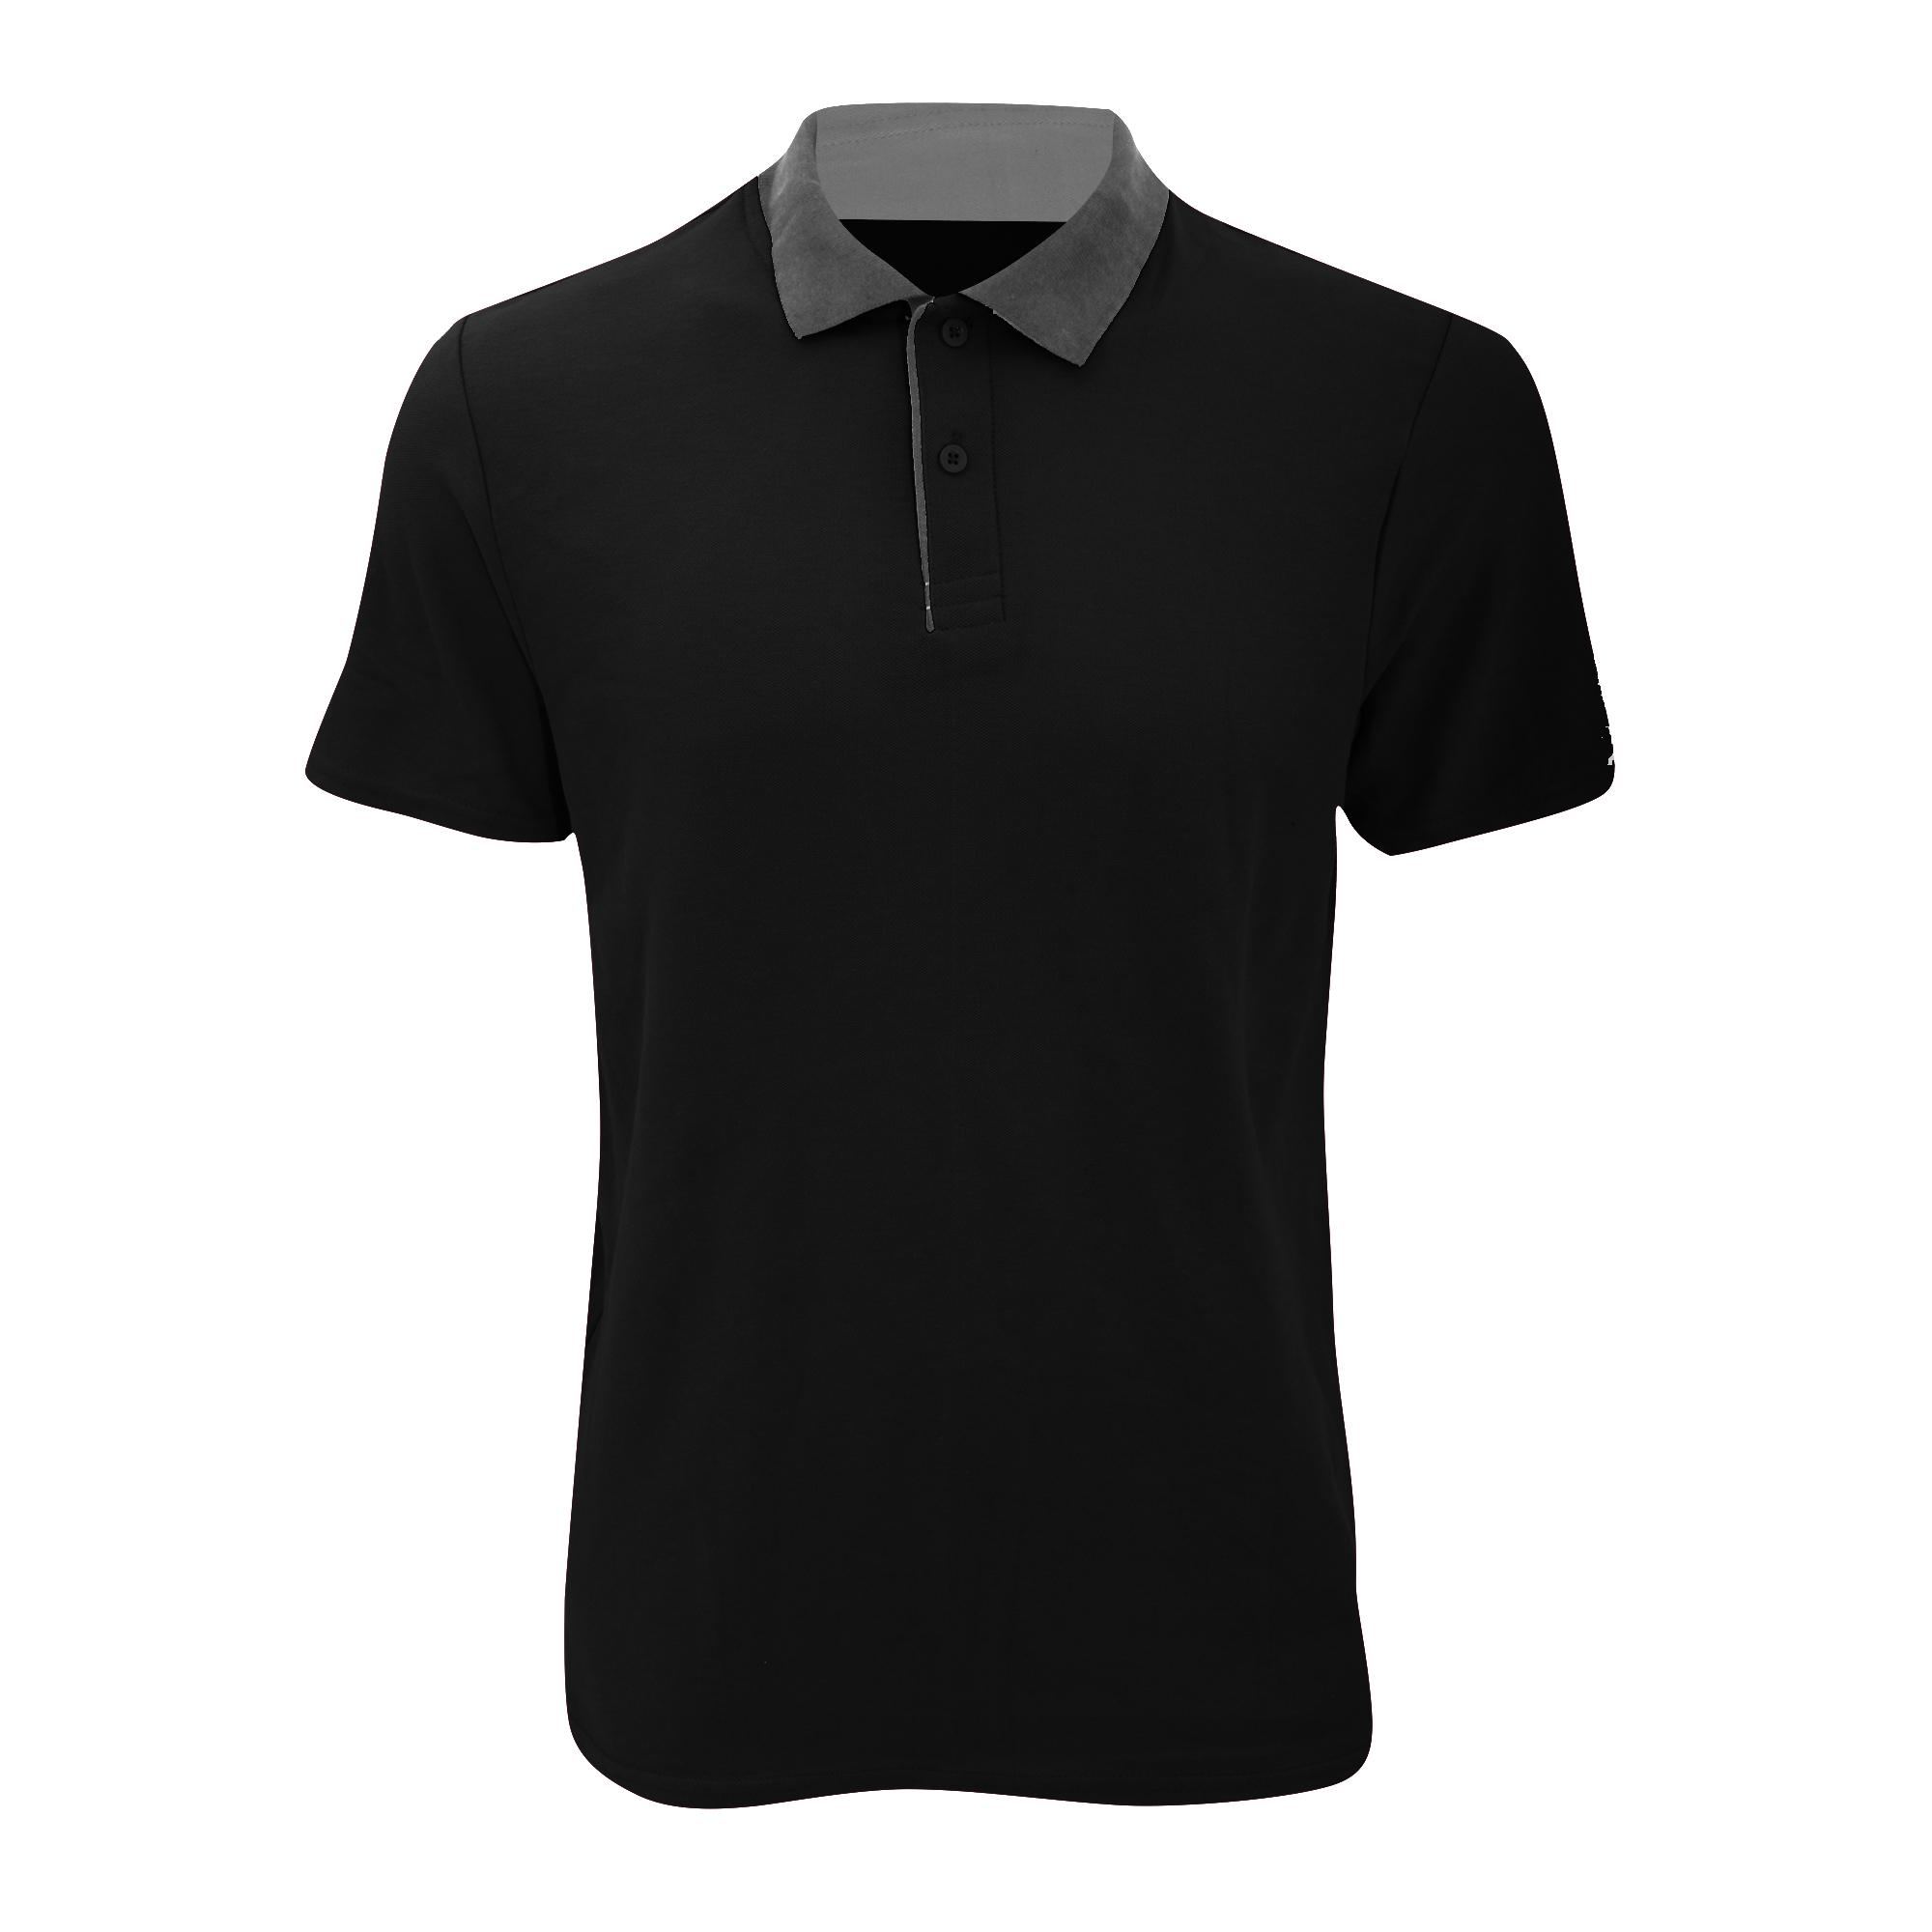 RTXtra Men/'s Classic Polo Top Shirt 3 Button Smart Casual Wear T-shirt Plain New